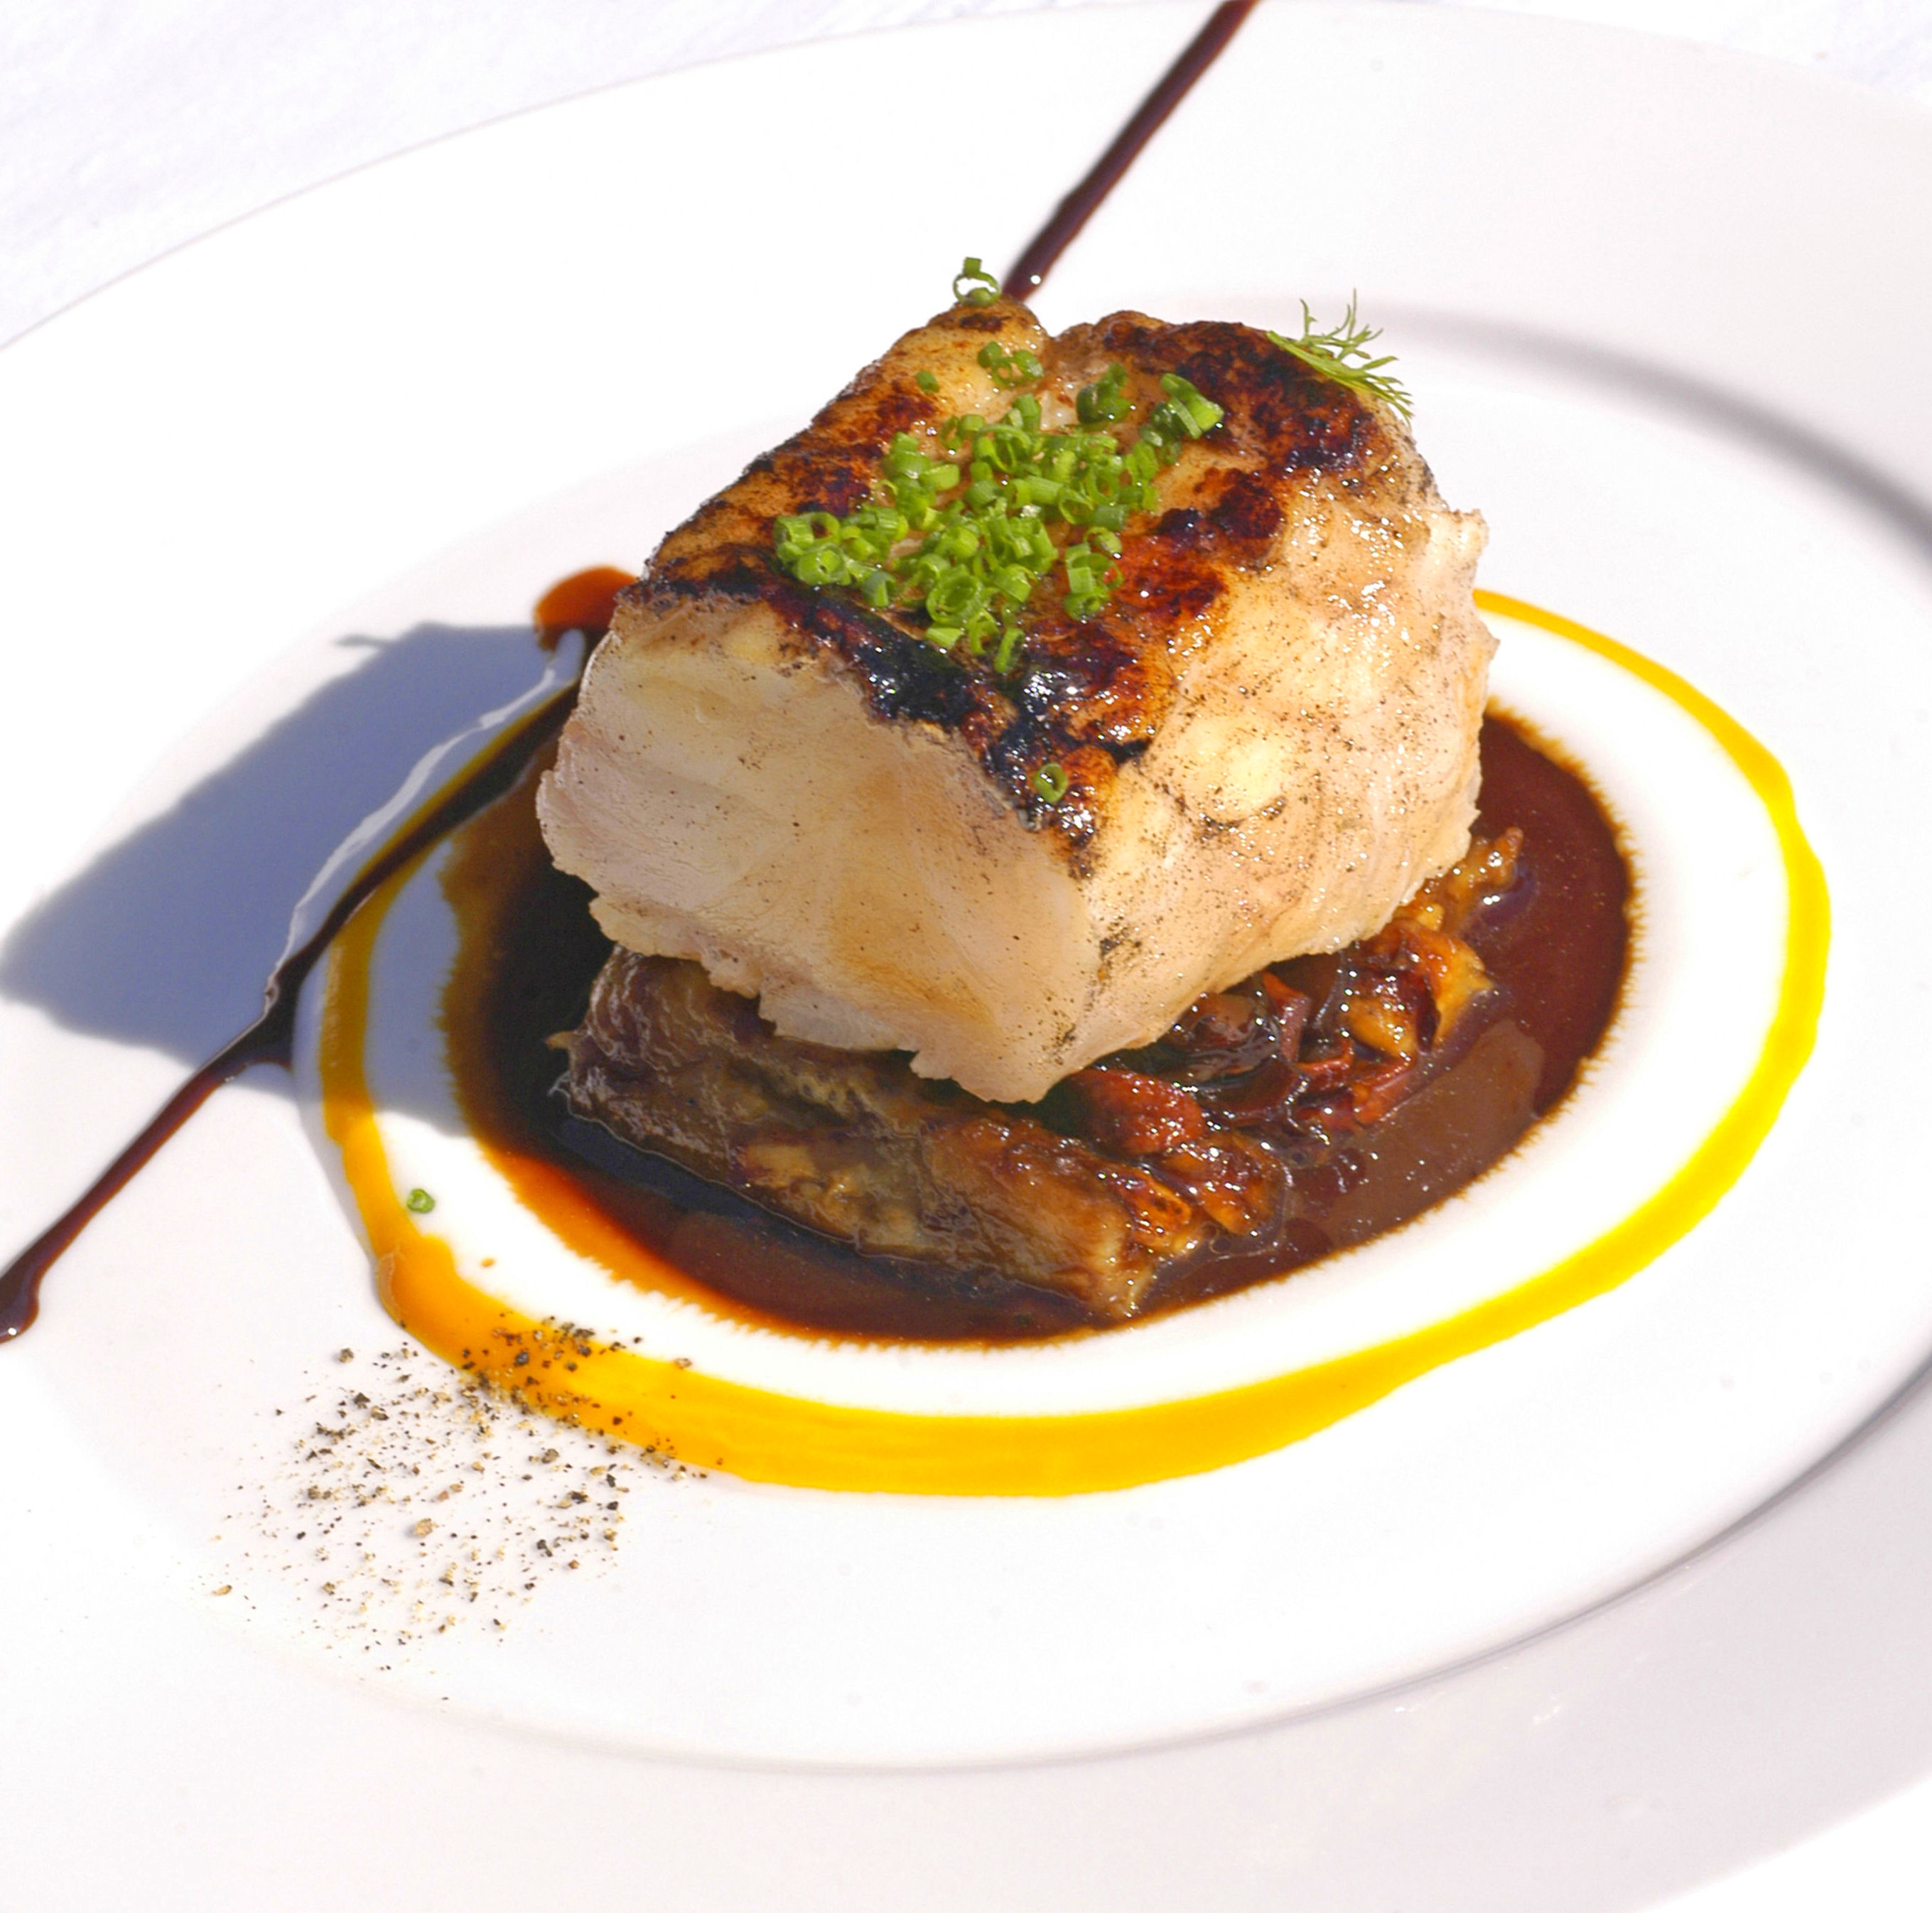 Foto 8 de Restaurantes en Eivissa | Cositasricas